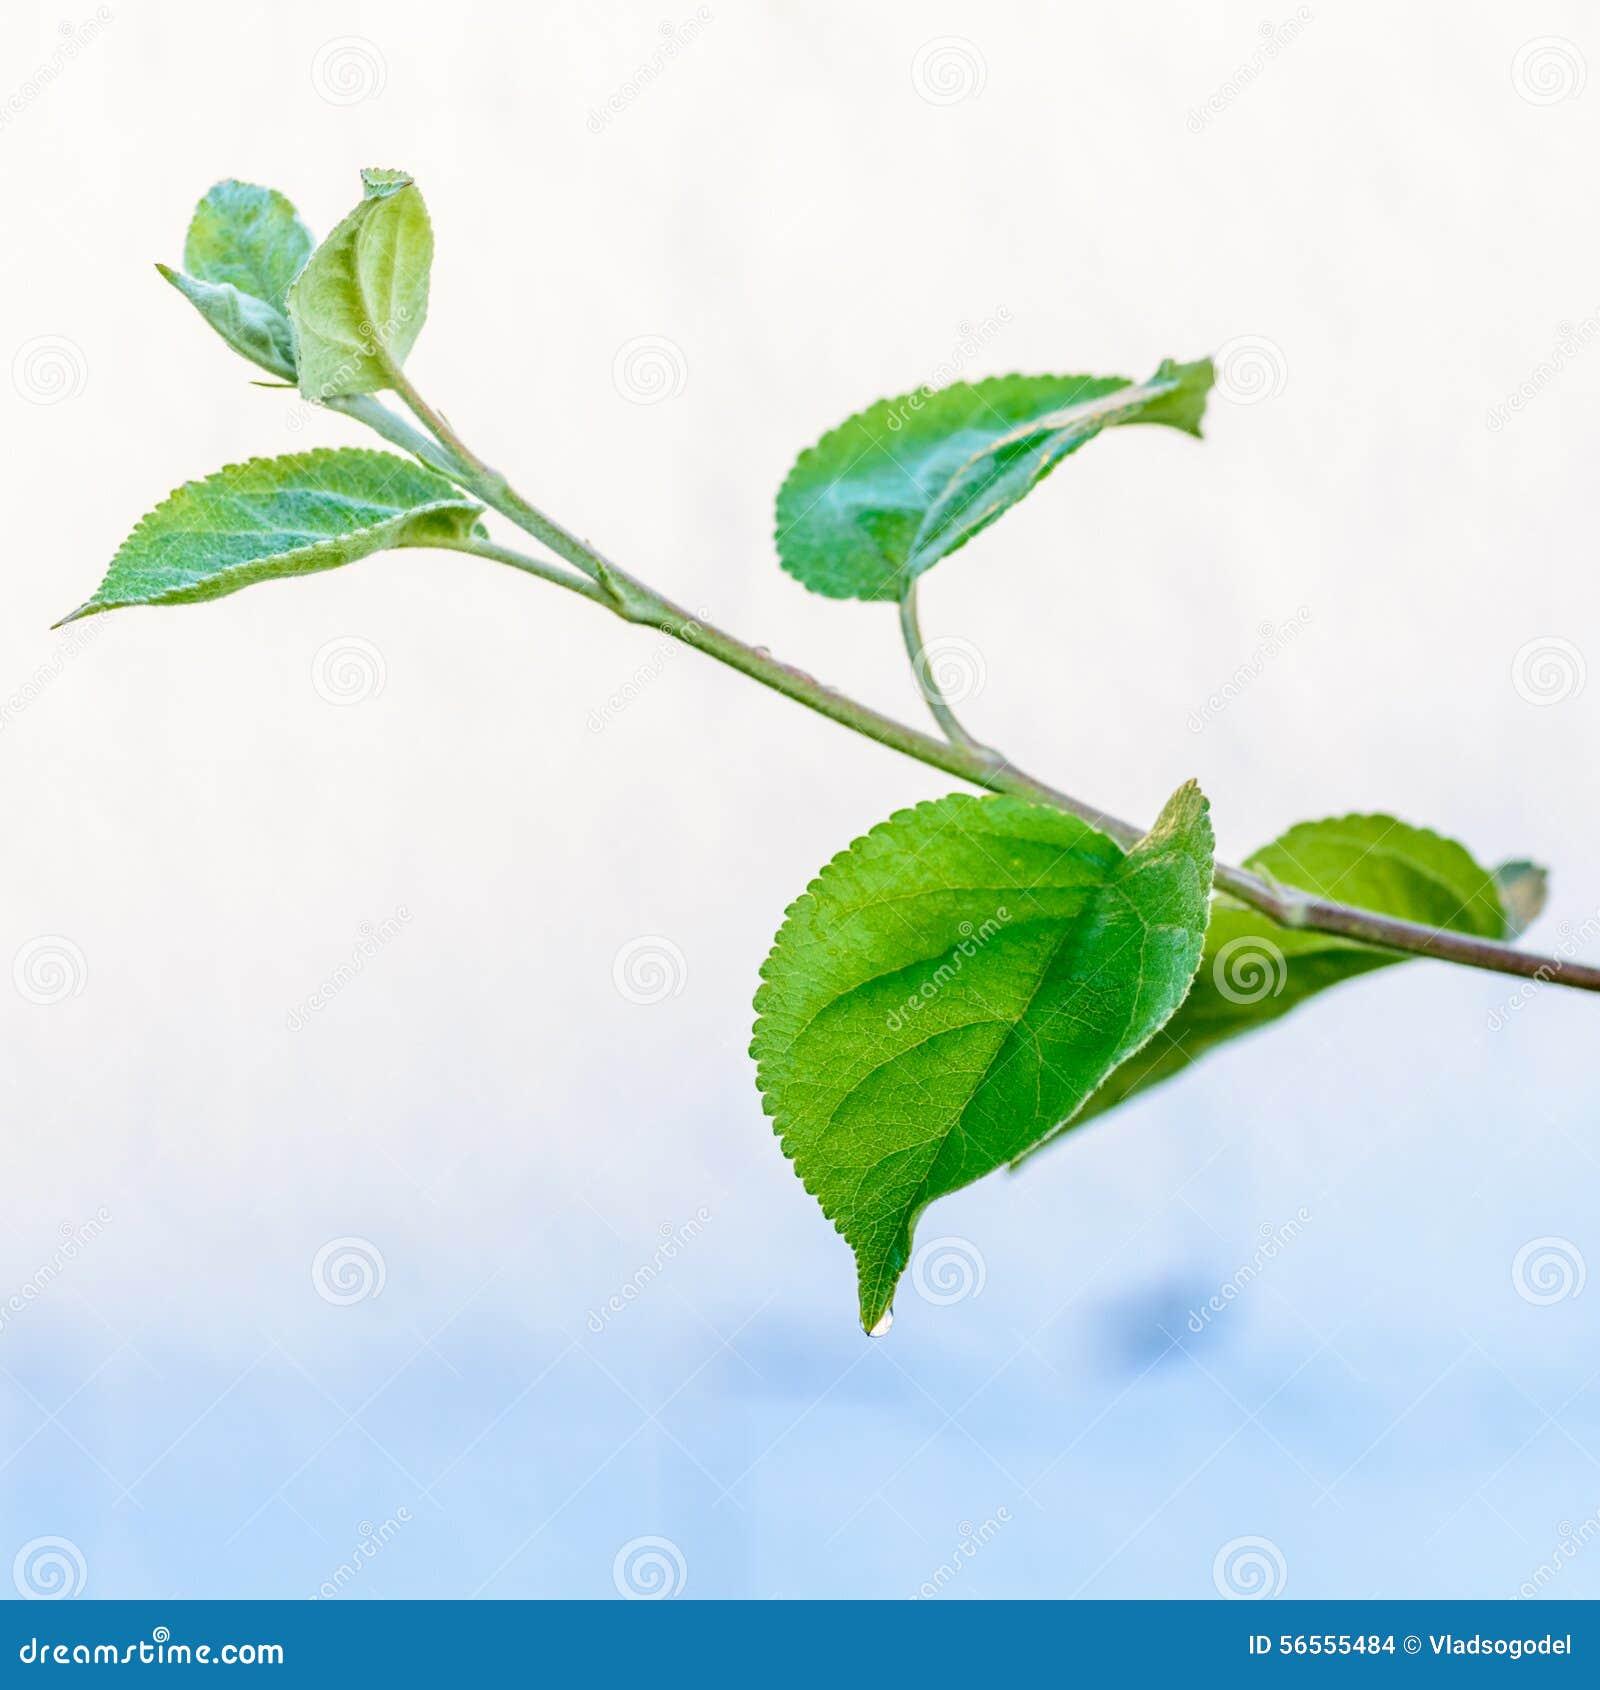 Download Πράσινο φρέσκο φύλλο από τον κλάδο ενός δέντρου Κλείστε επάνω τη λεπτομέρεια ενός φύλλου Στοκ Εικόνες - εικόνα από ανασκόπησης, φοίνικας: 56555484